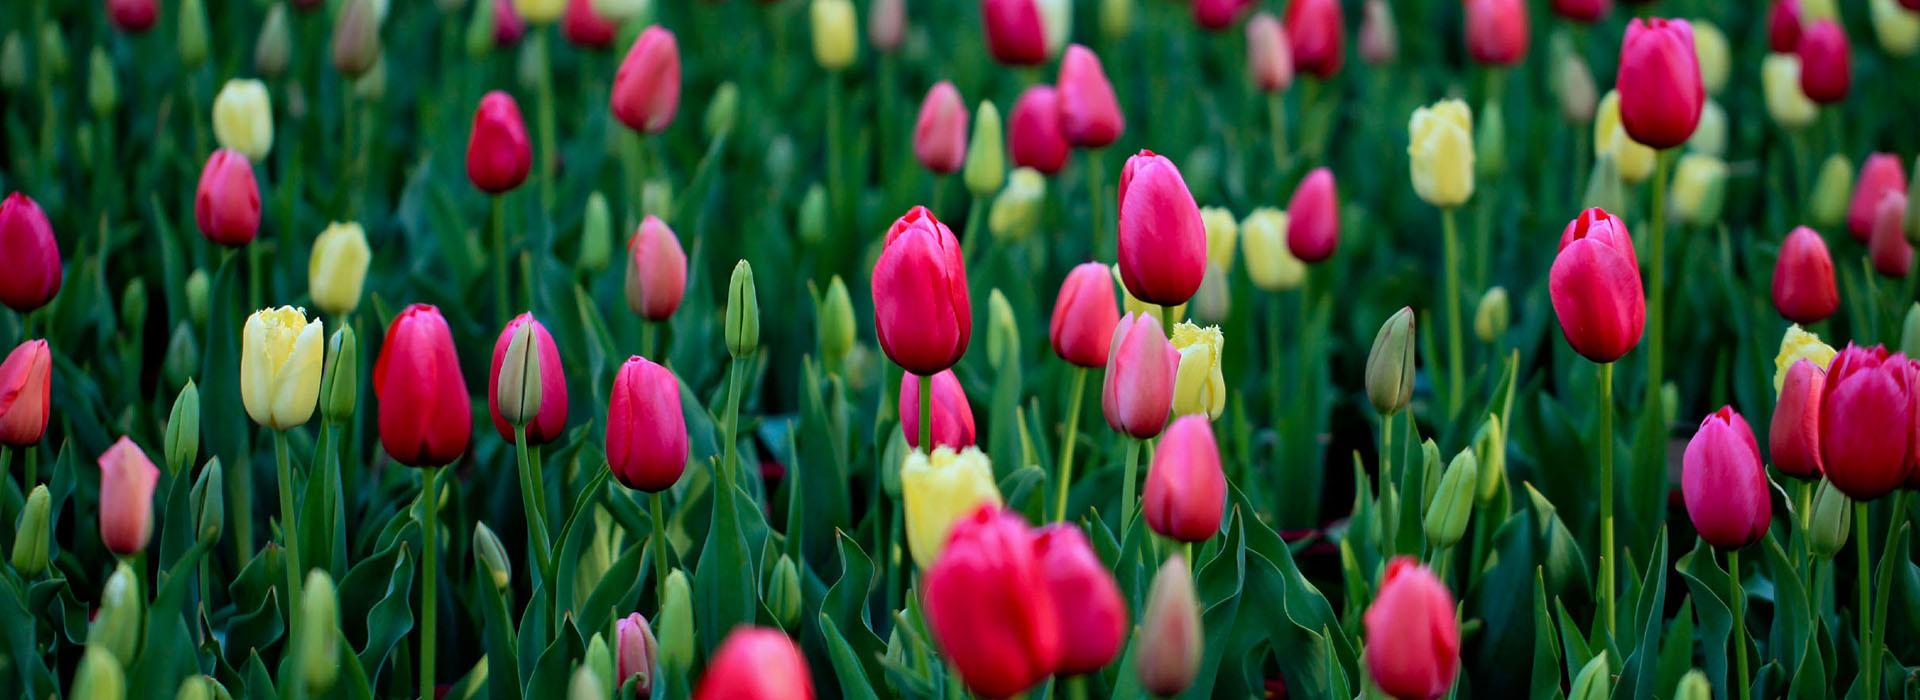 Lễ hội hoa Canberra